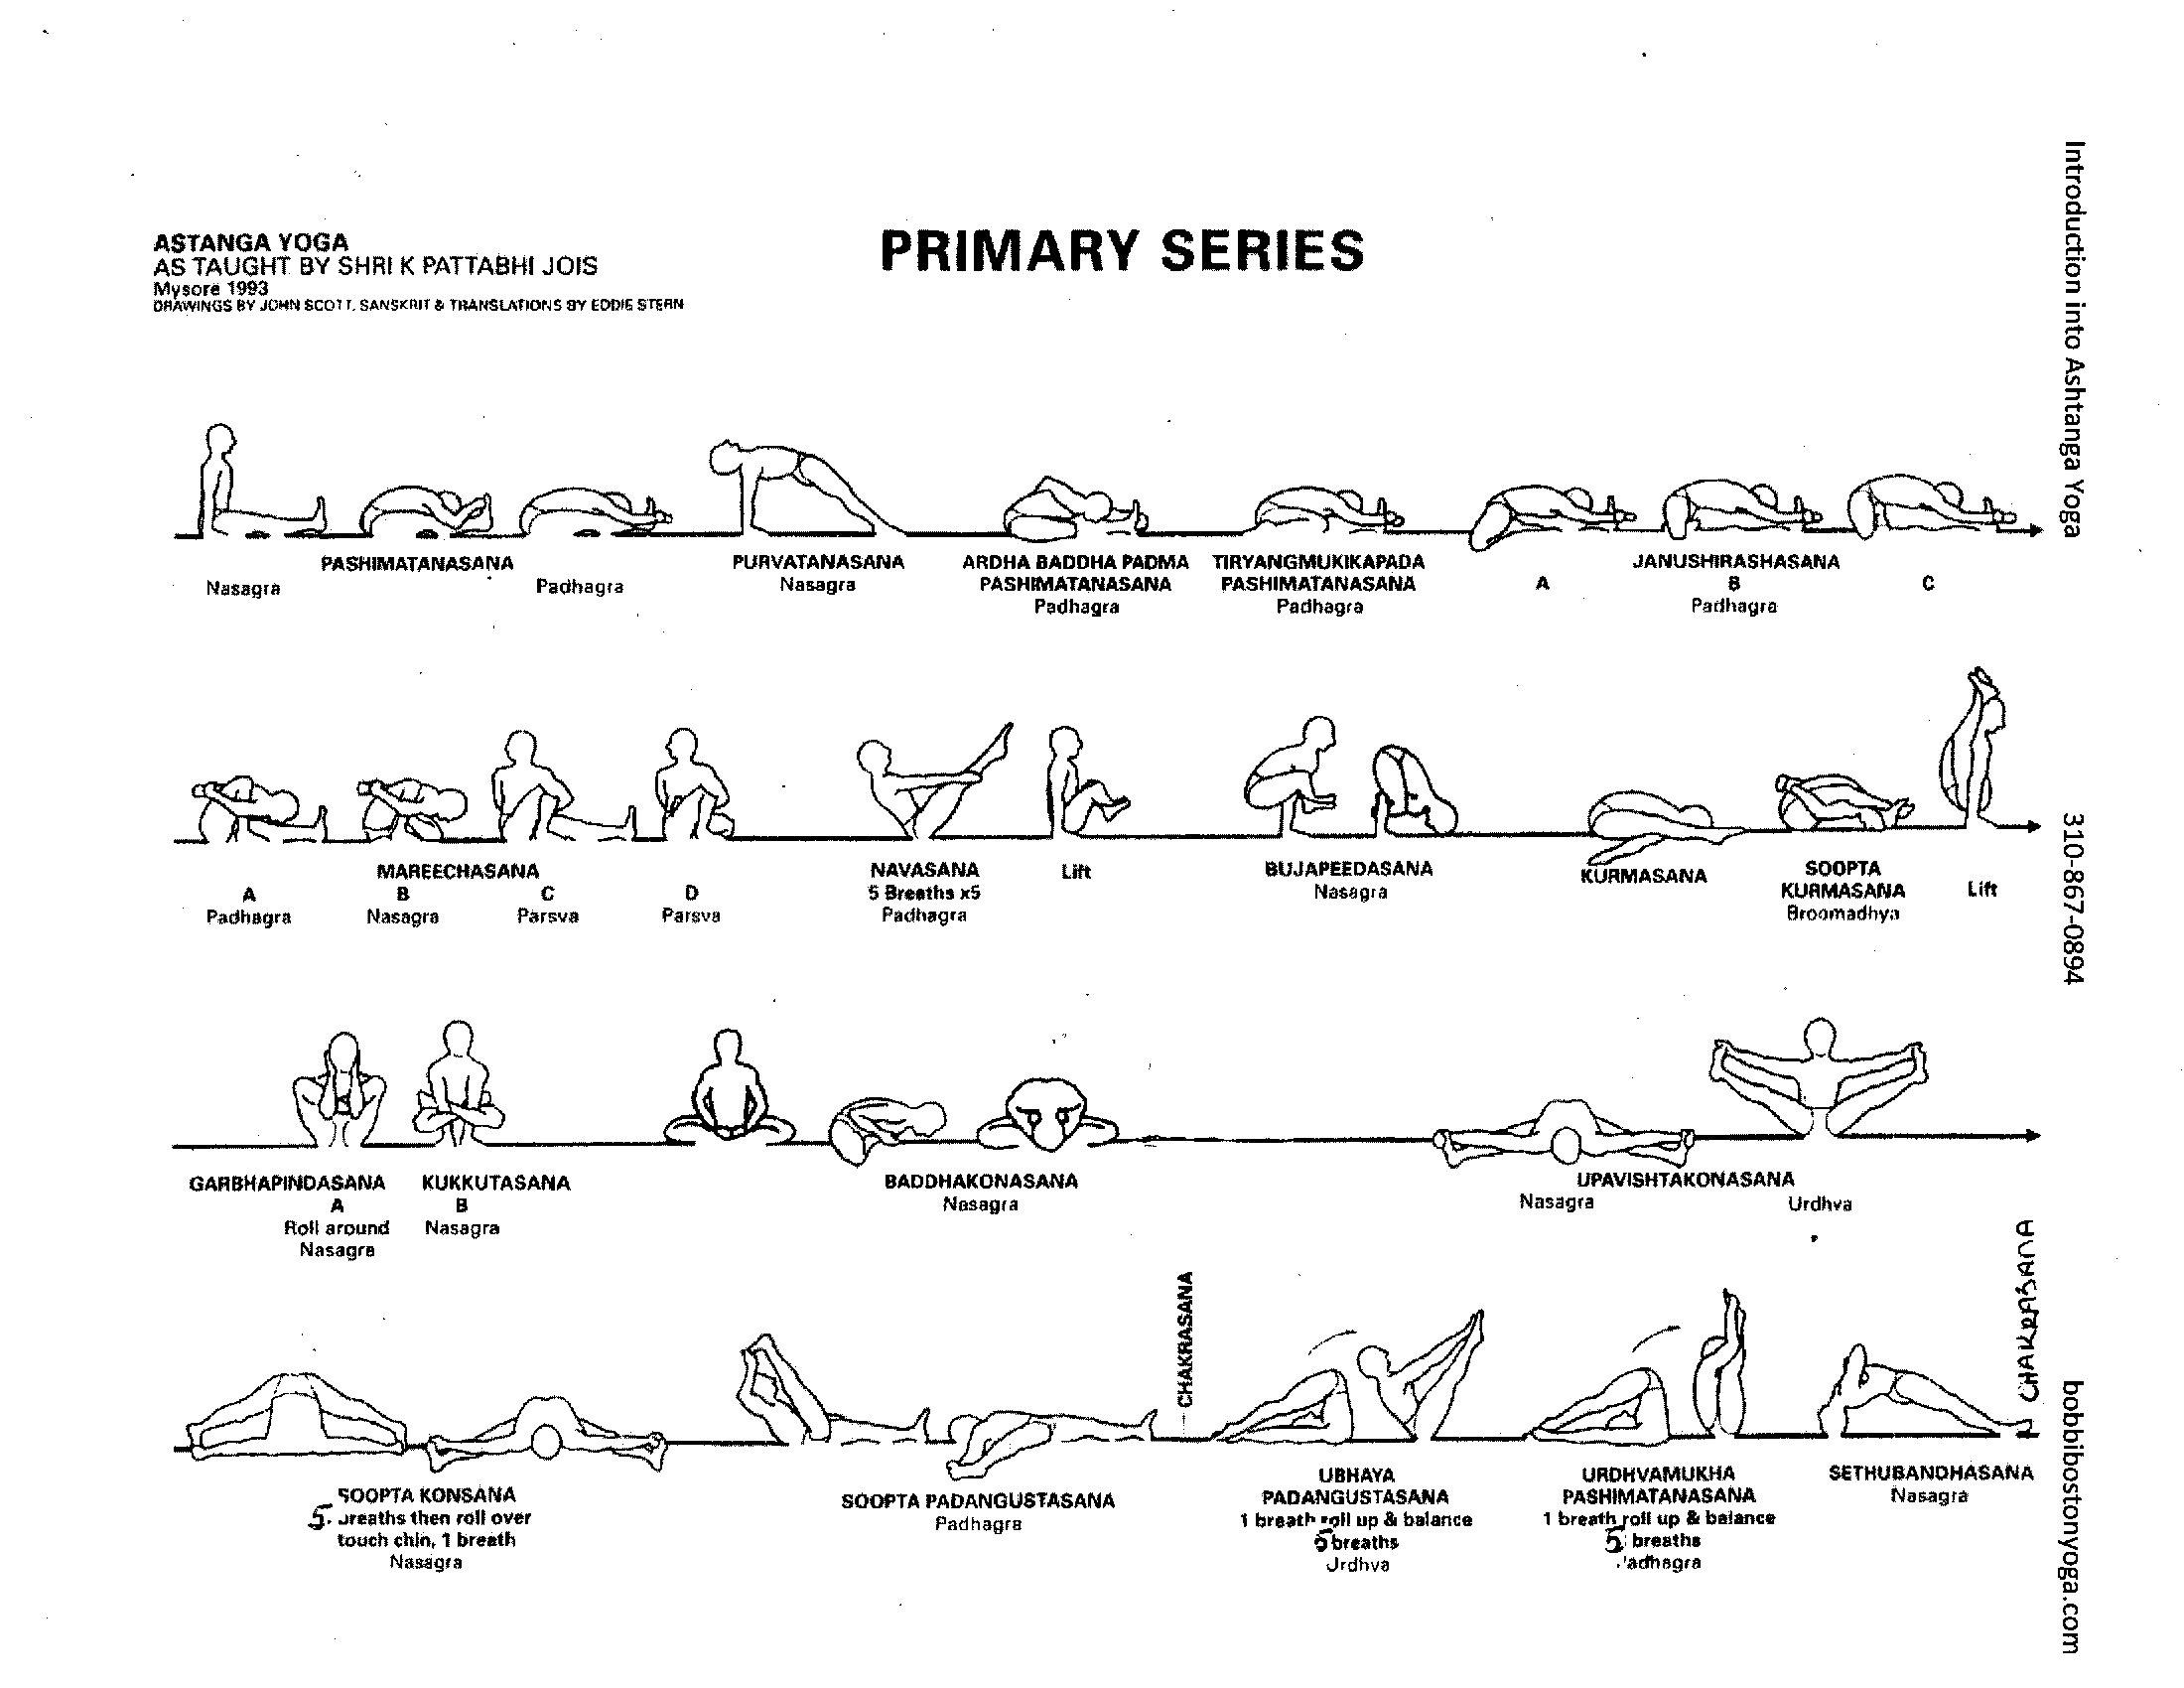 3 primary series